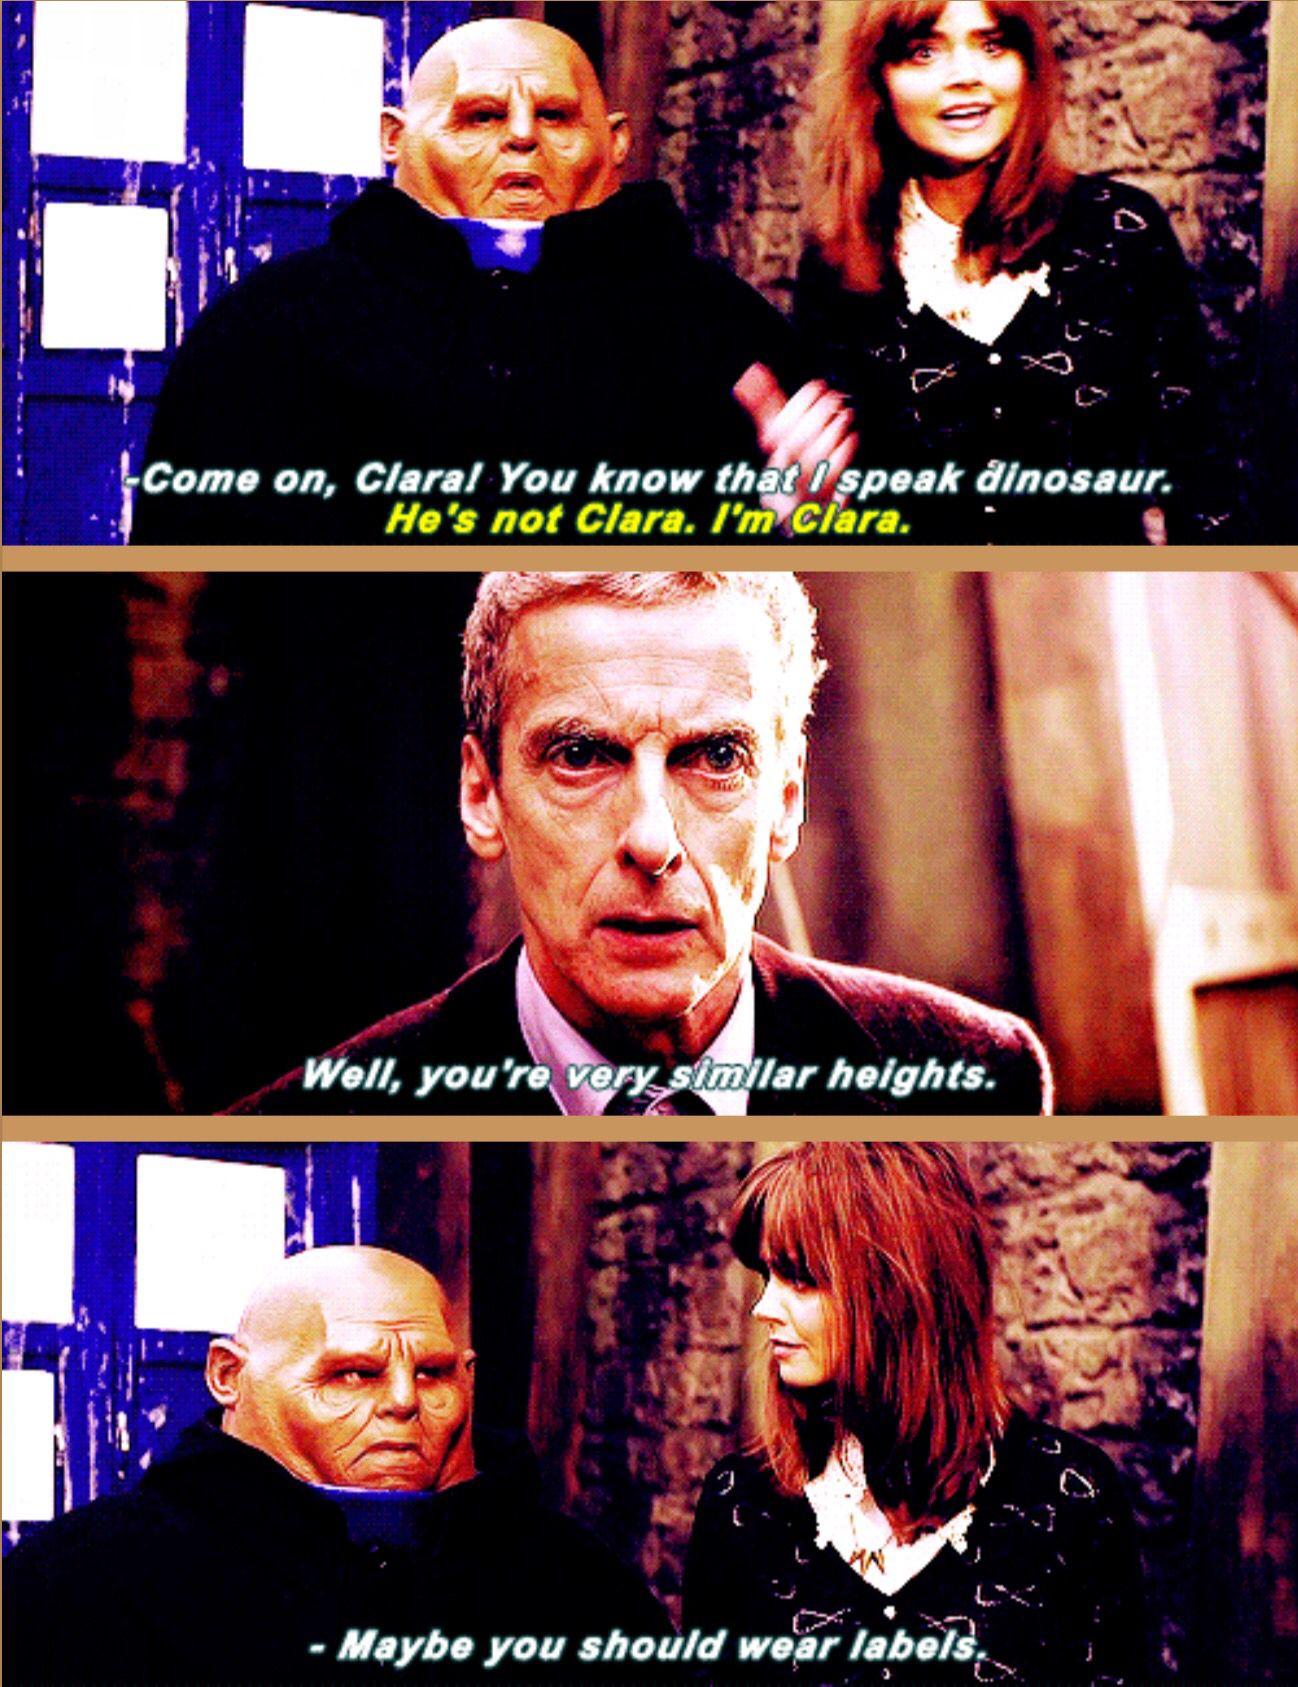 """He's not Clara. I'm Clara!"""